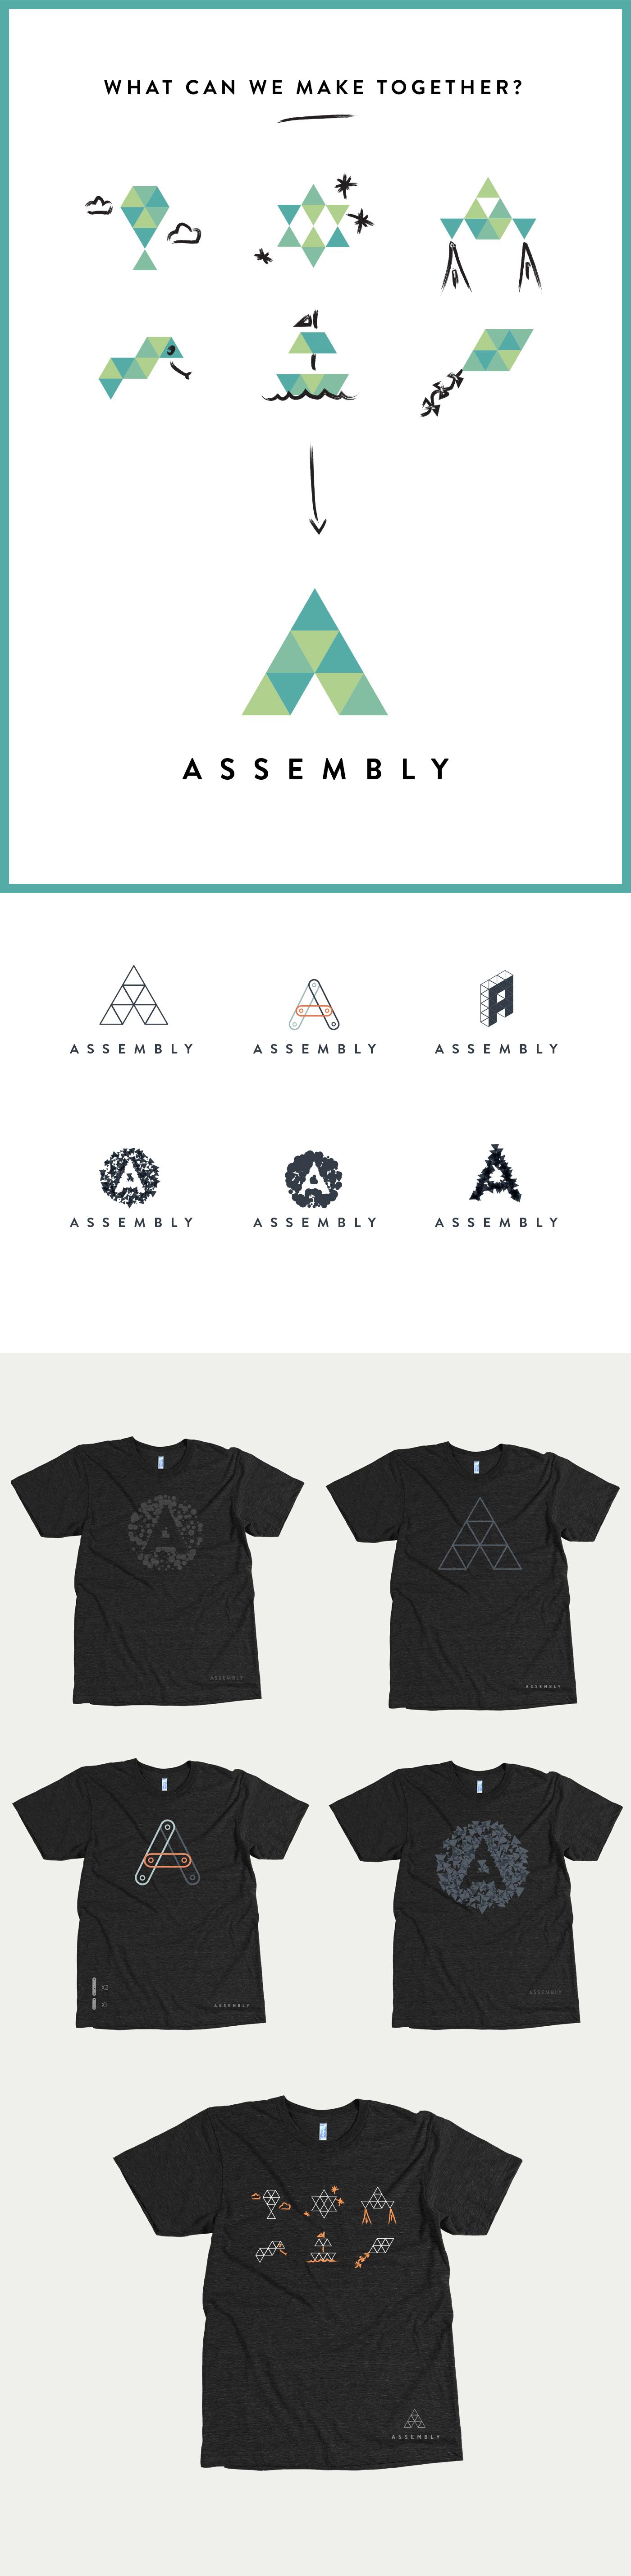 New asm brand ideas